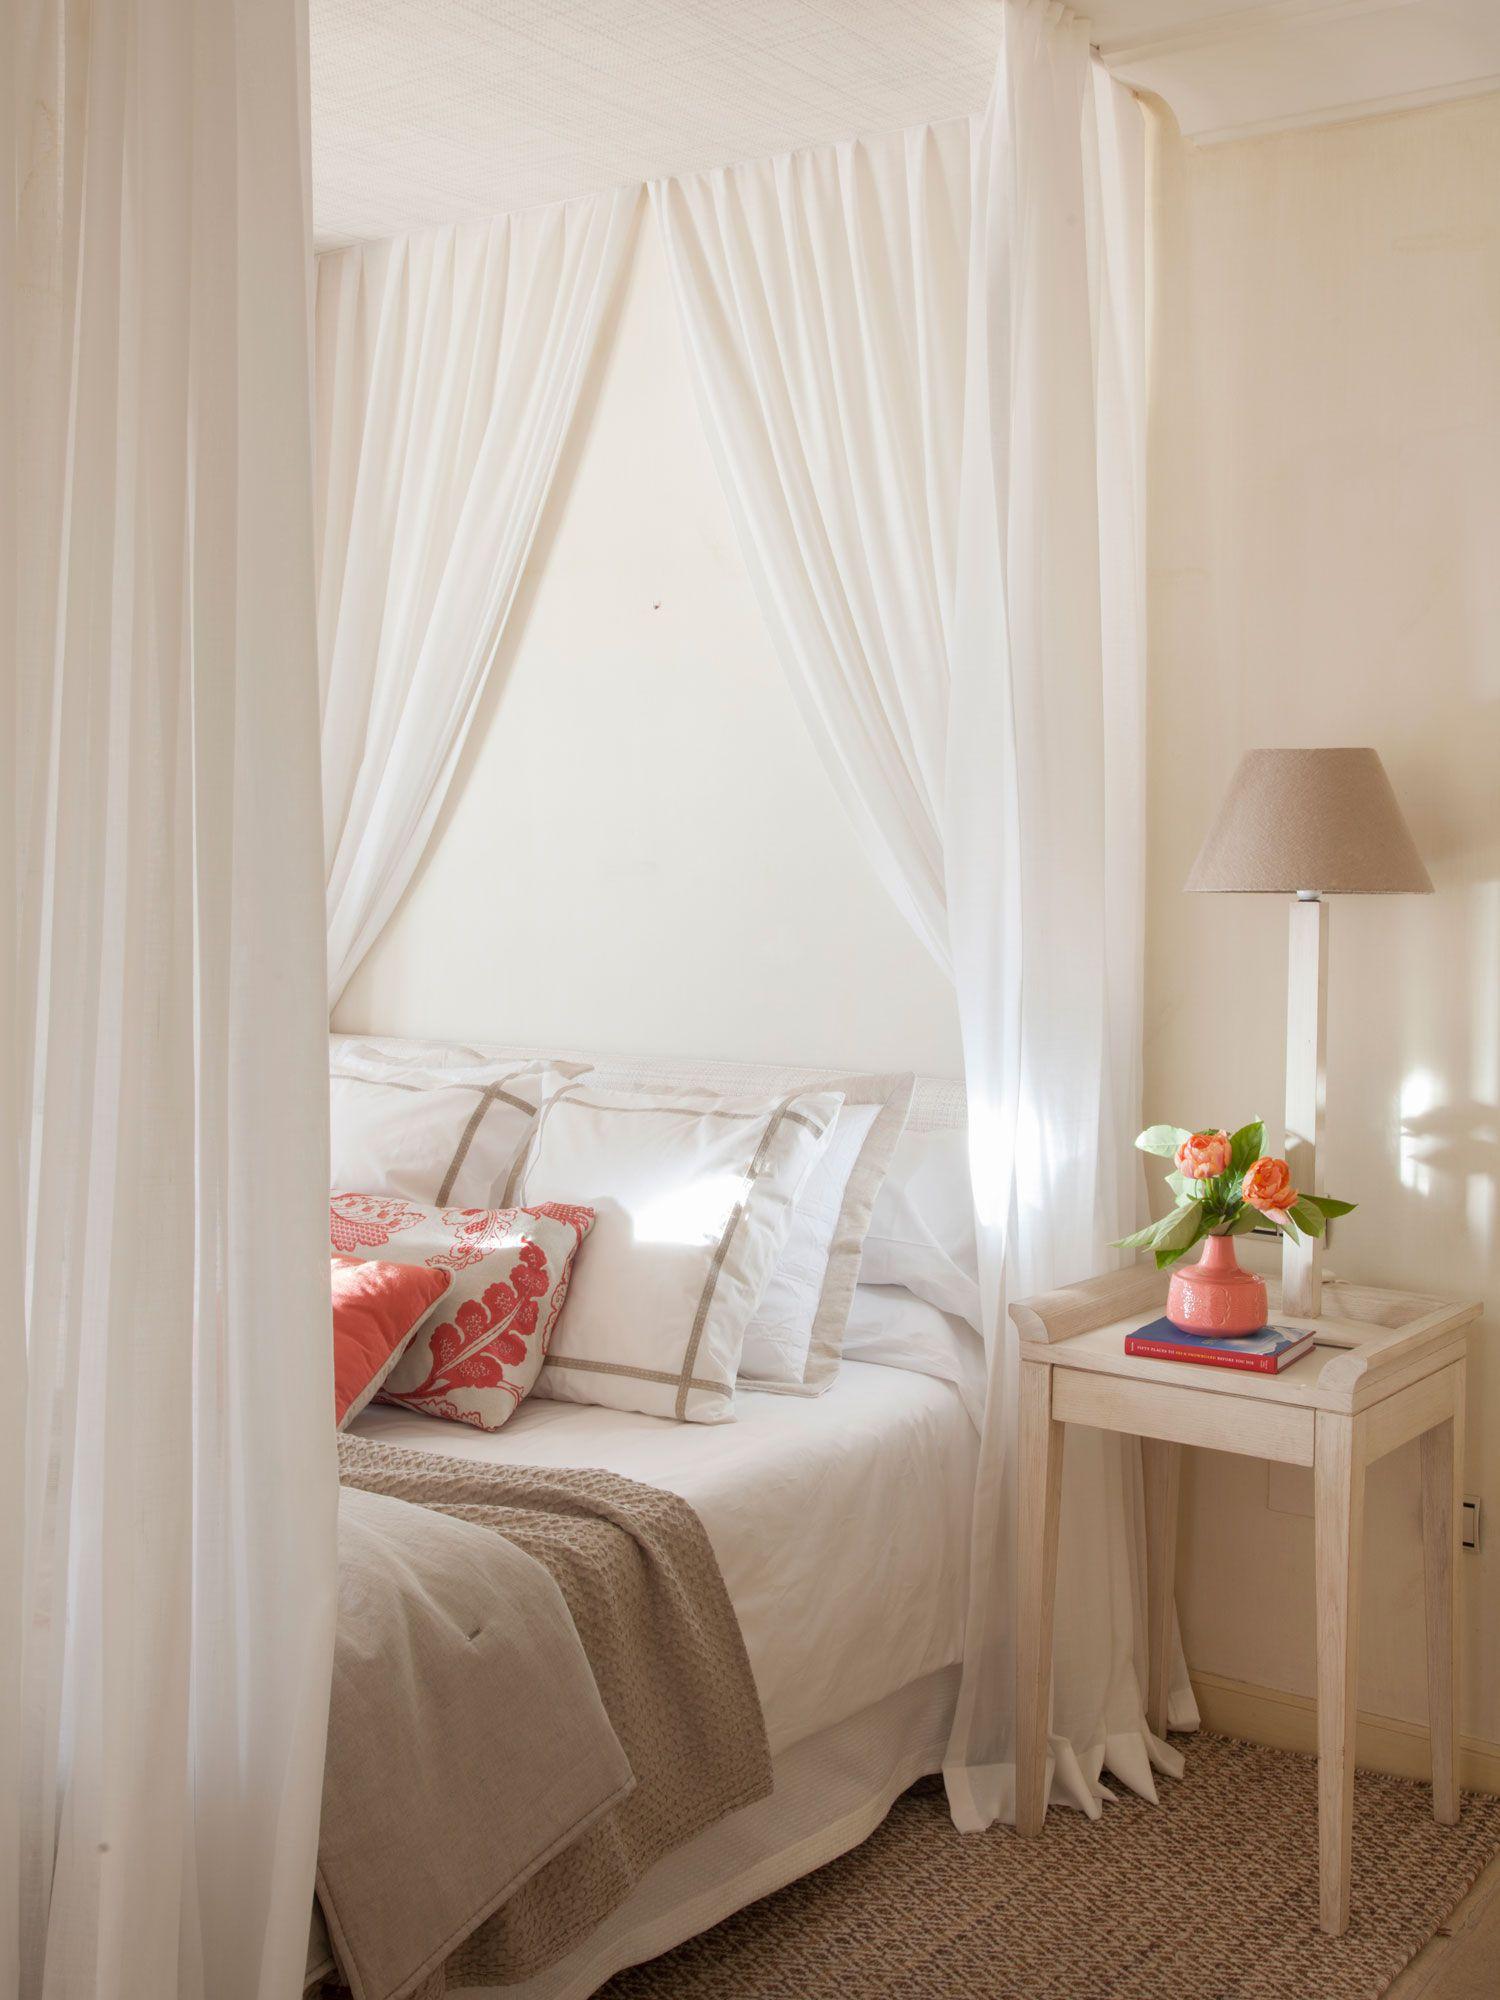 Detalle De Cama Con Dosel. FarbenRomantische SchlafzimmerSchlafzimmer ...